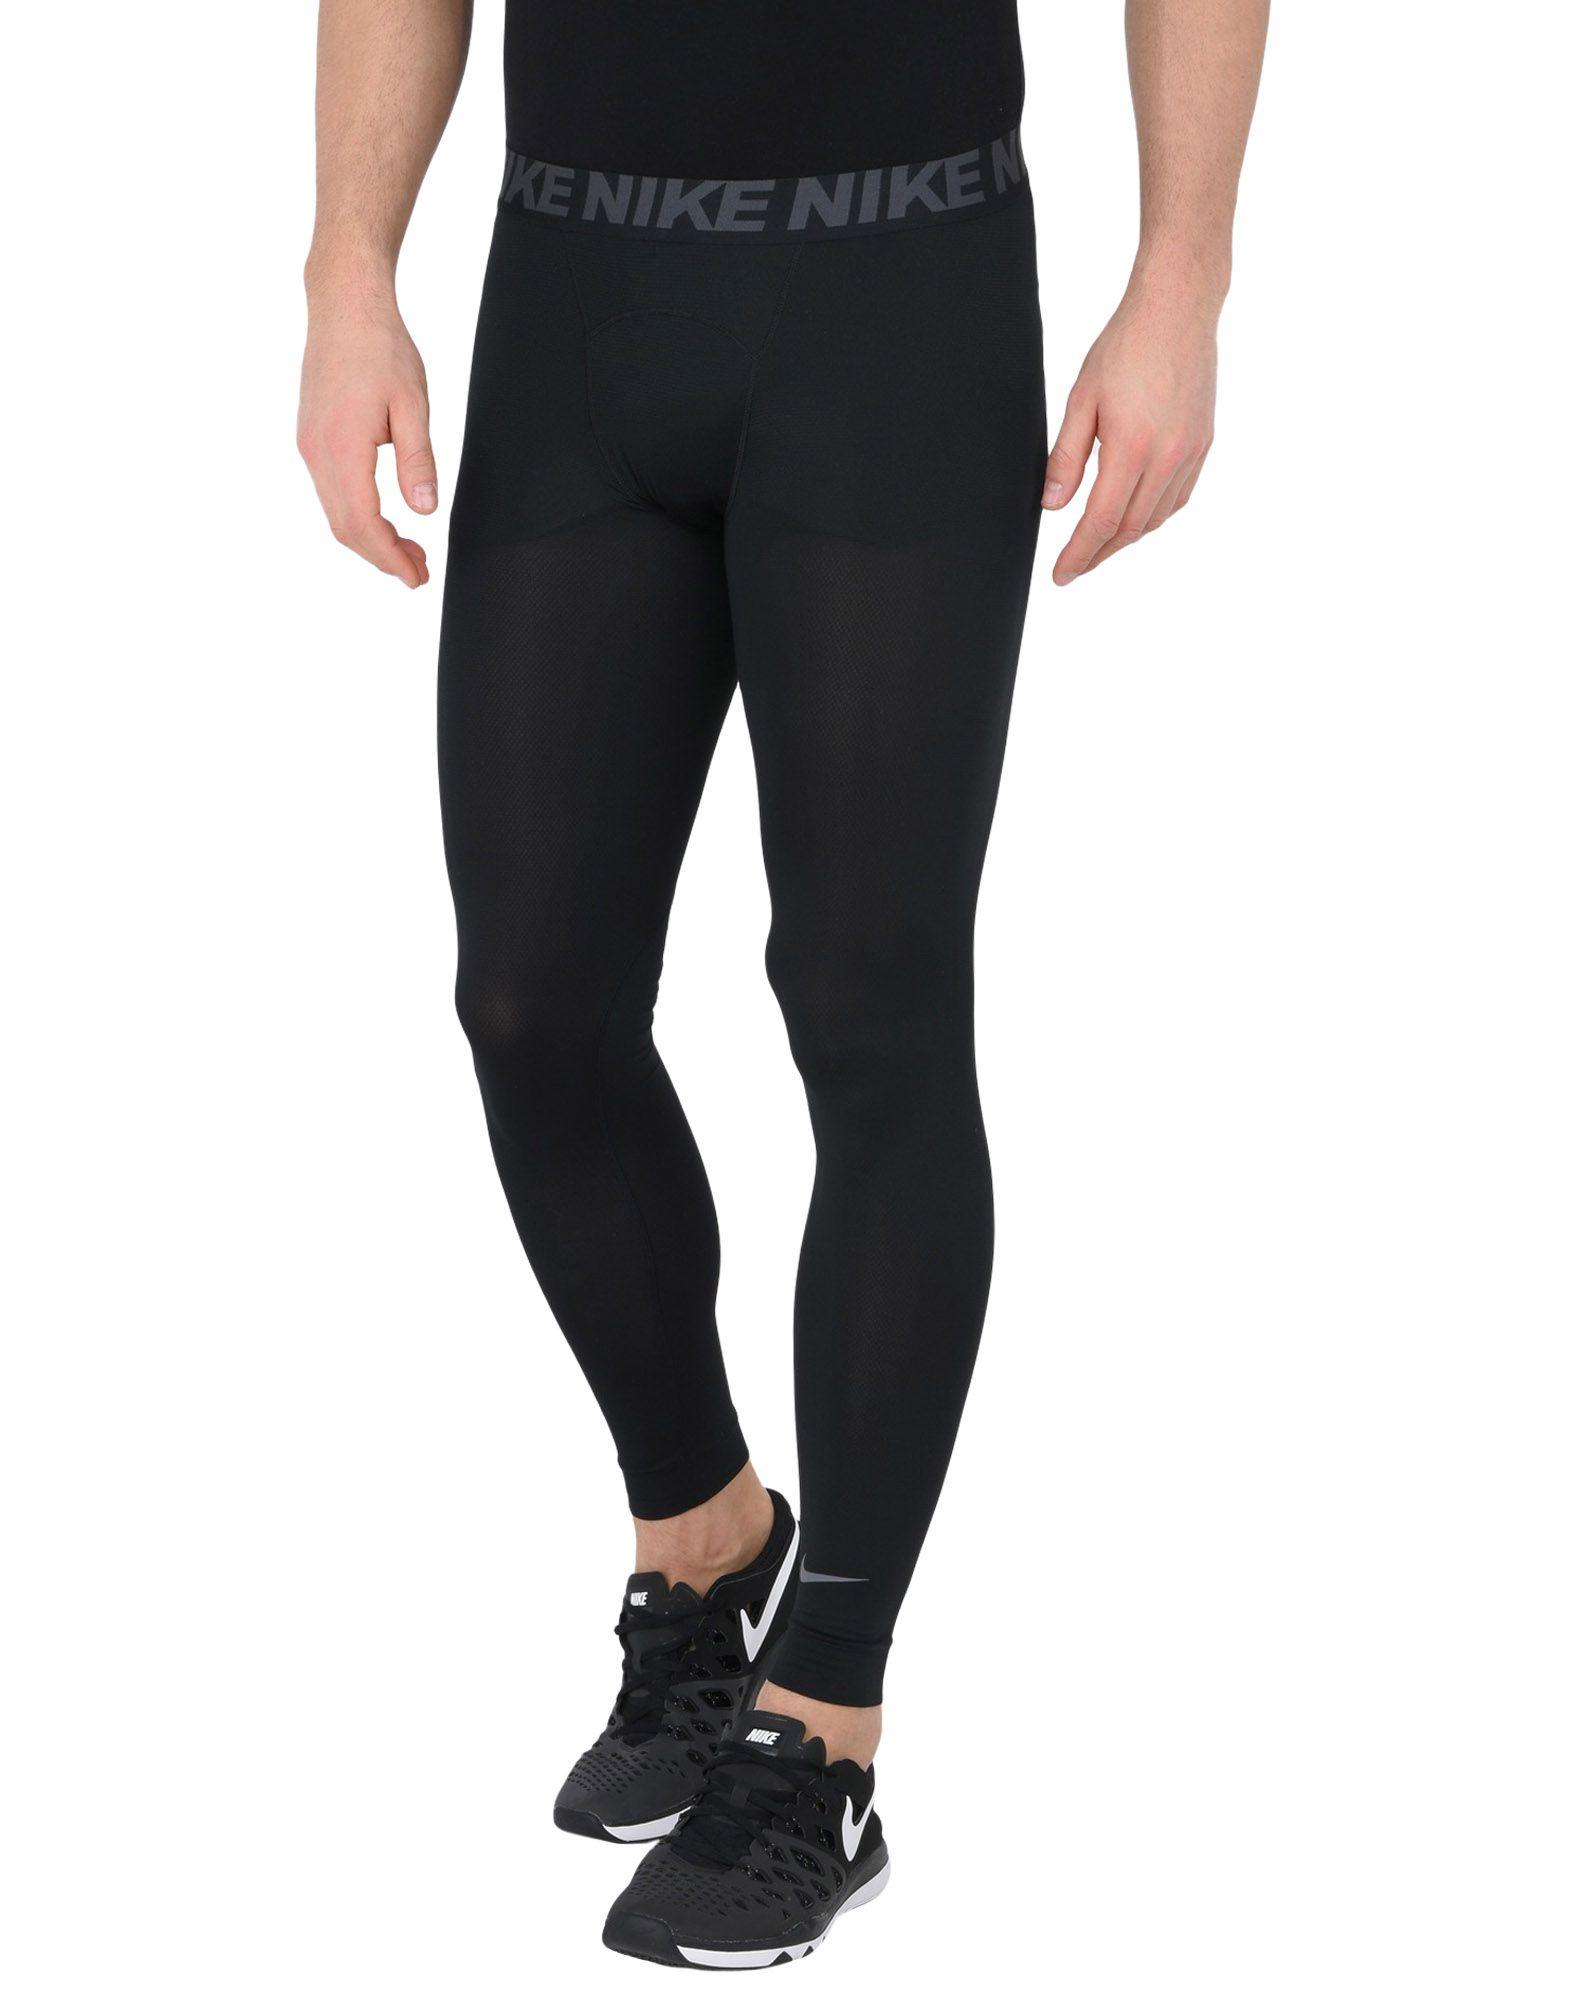 Nike Tight Utility Leggings Herren Leggings Nike auf YOOX